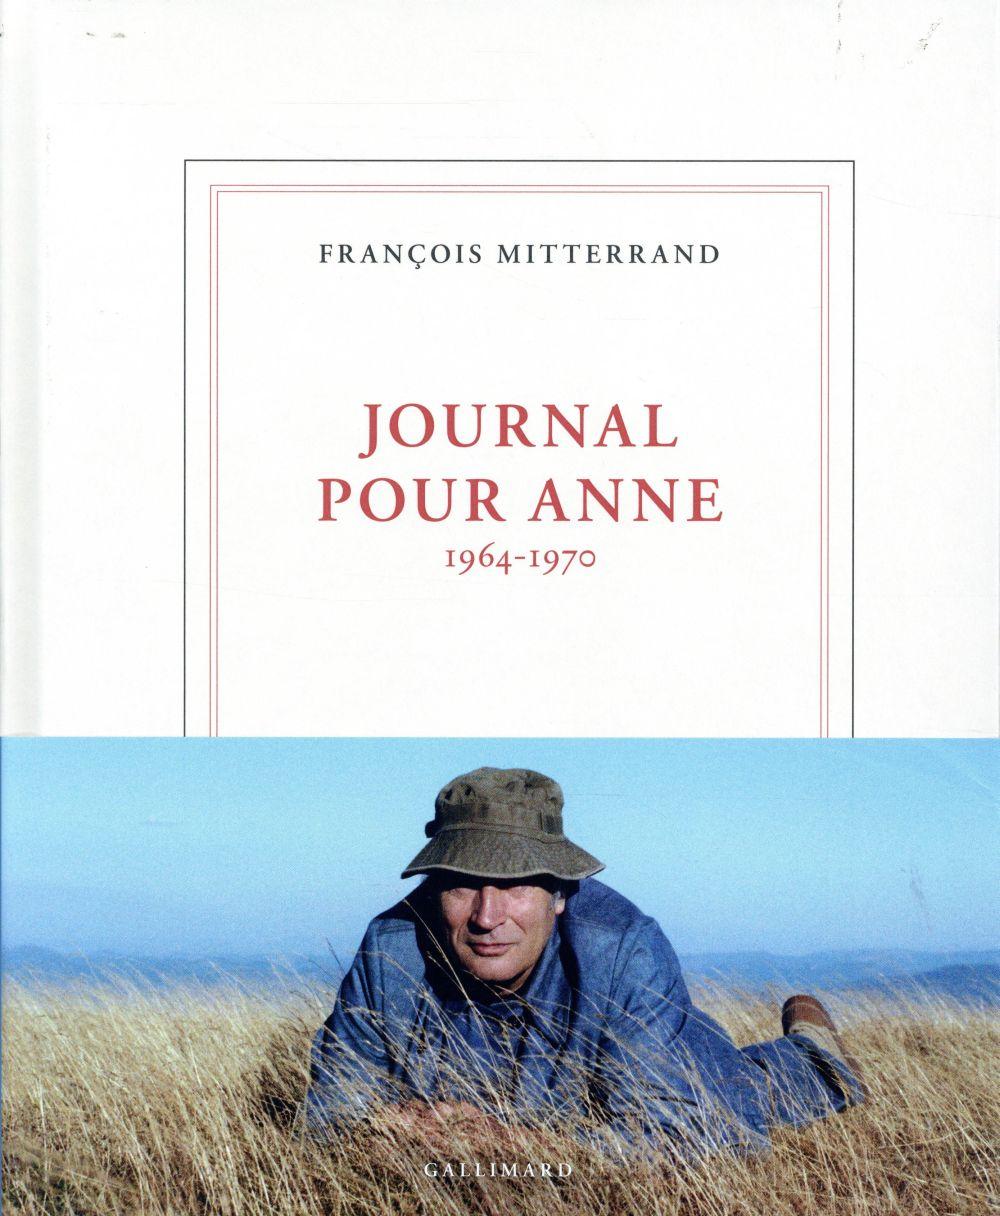 JOURNAL POUR ANNE